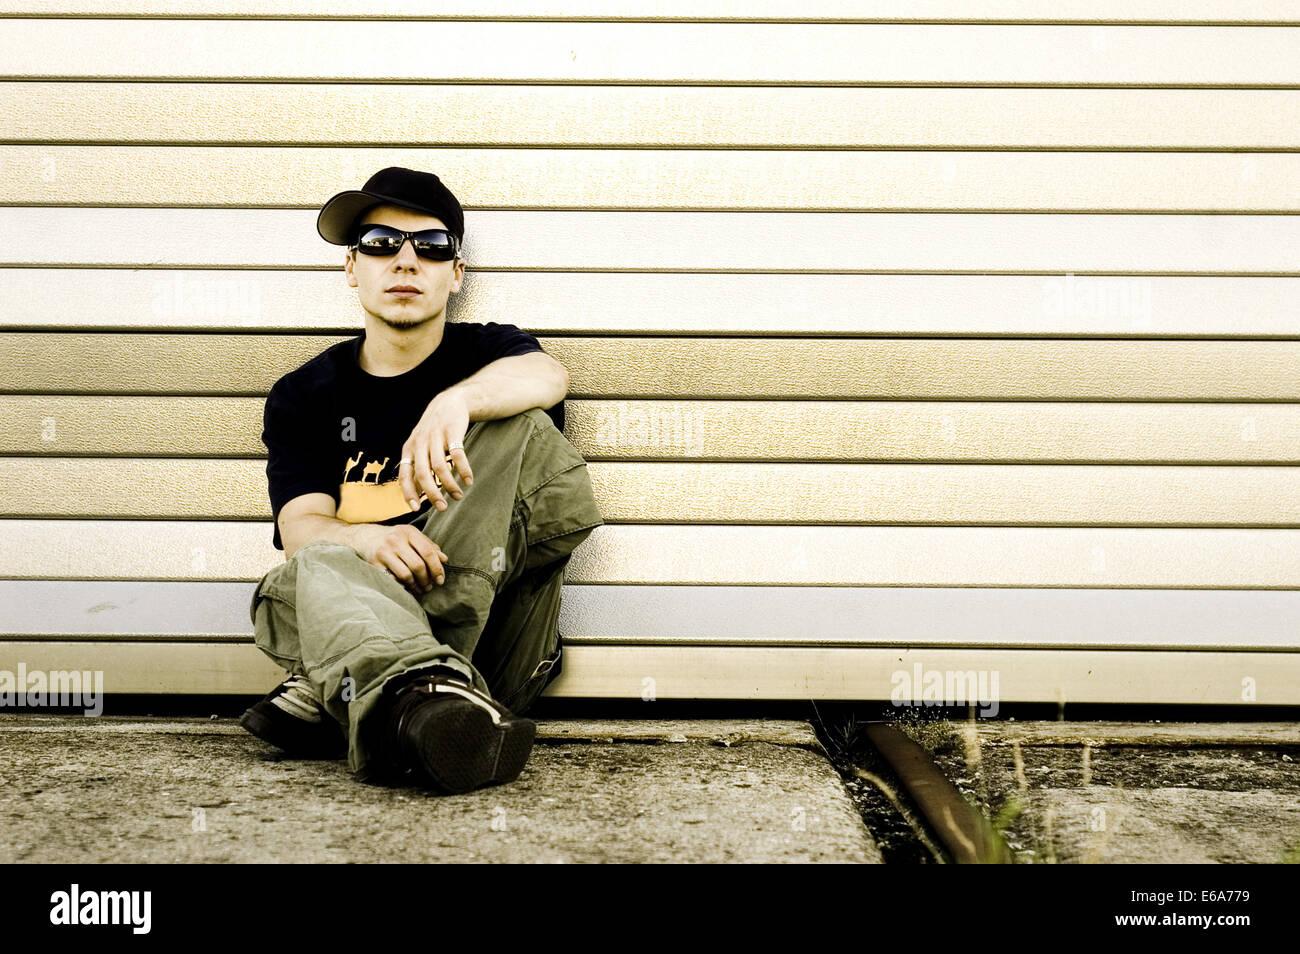 Adolescente,la cultura juvenil Imagen De Stock